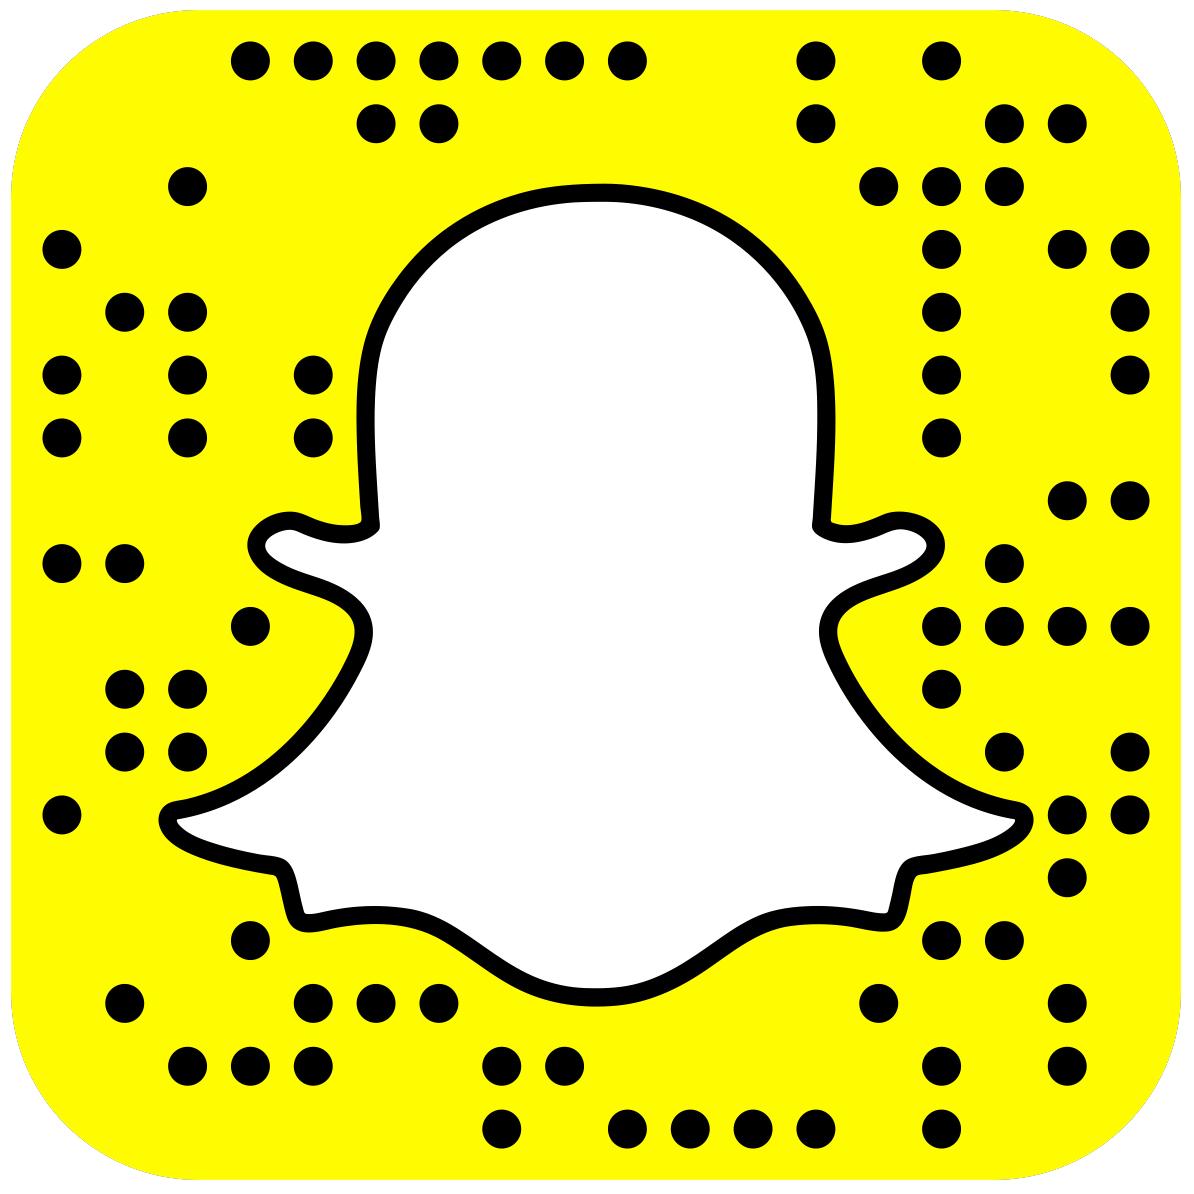 Kit Harington Snapchat username